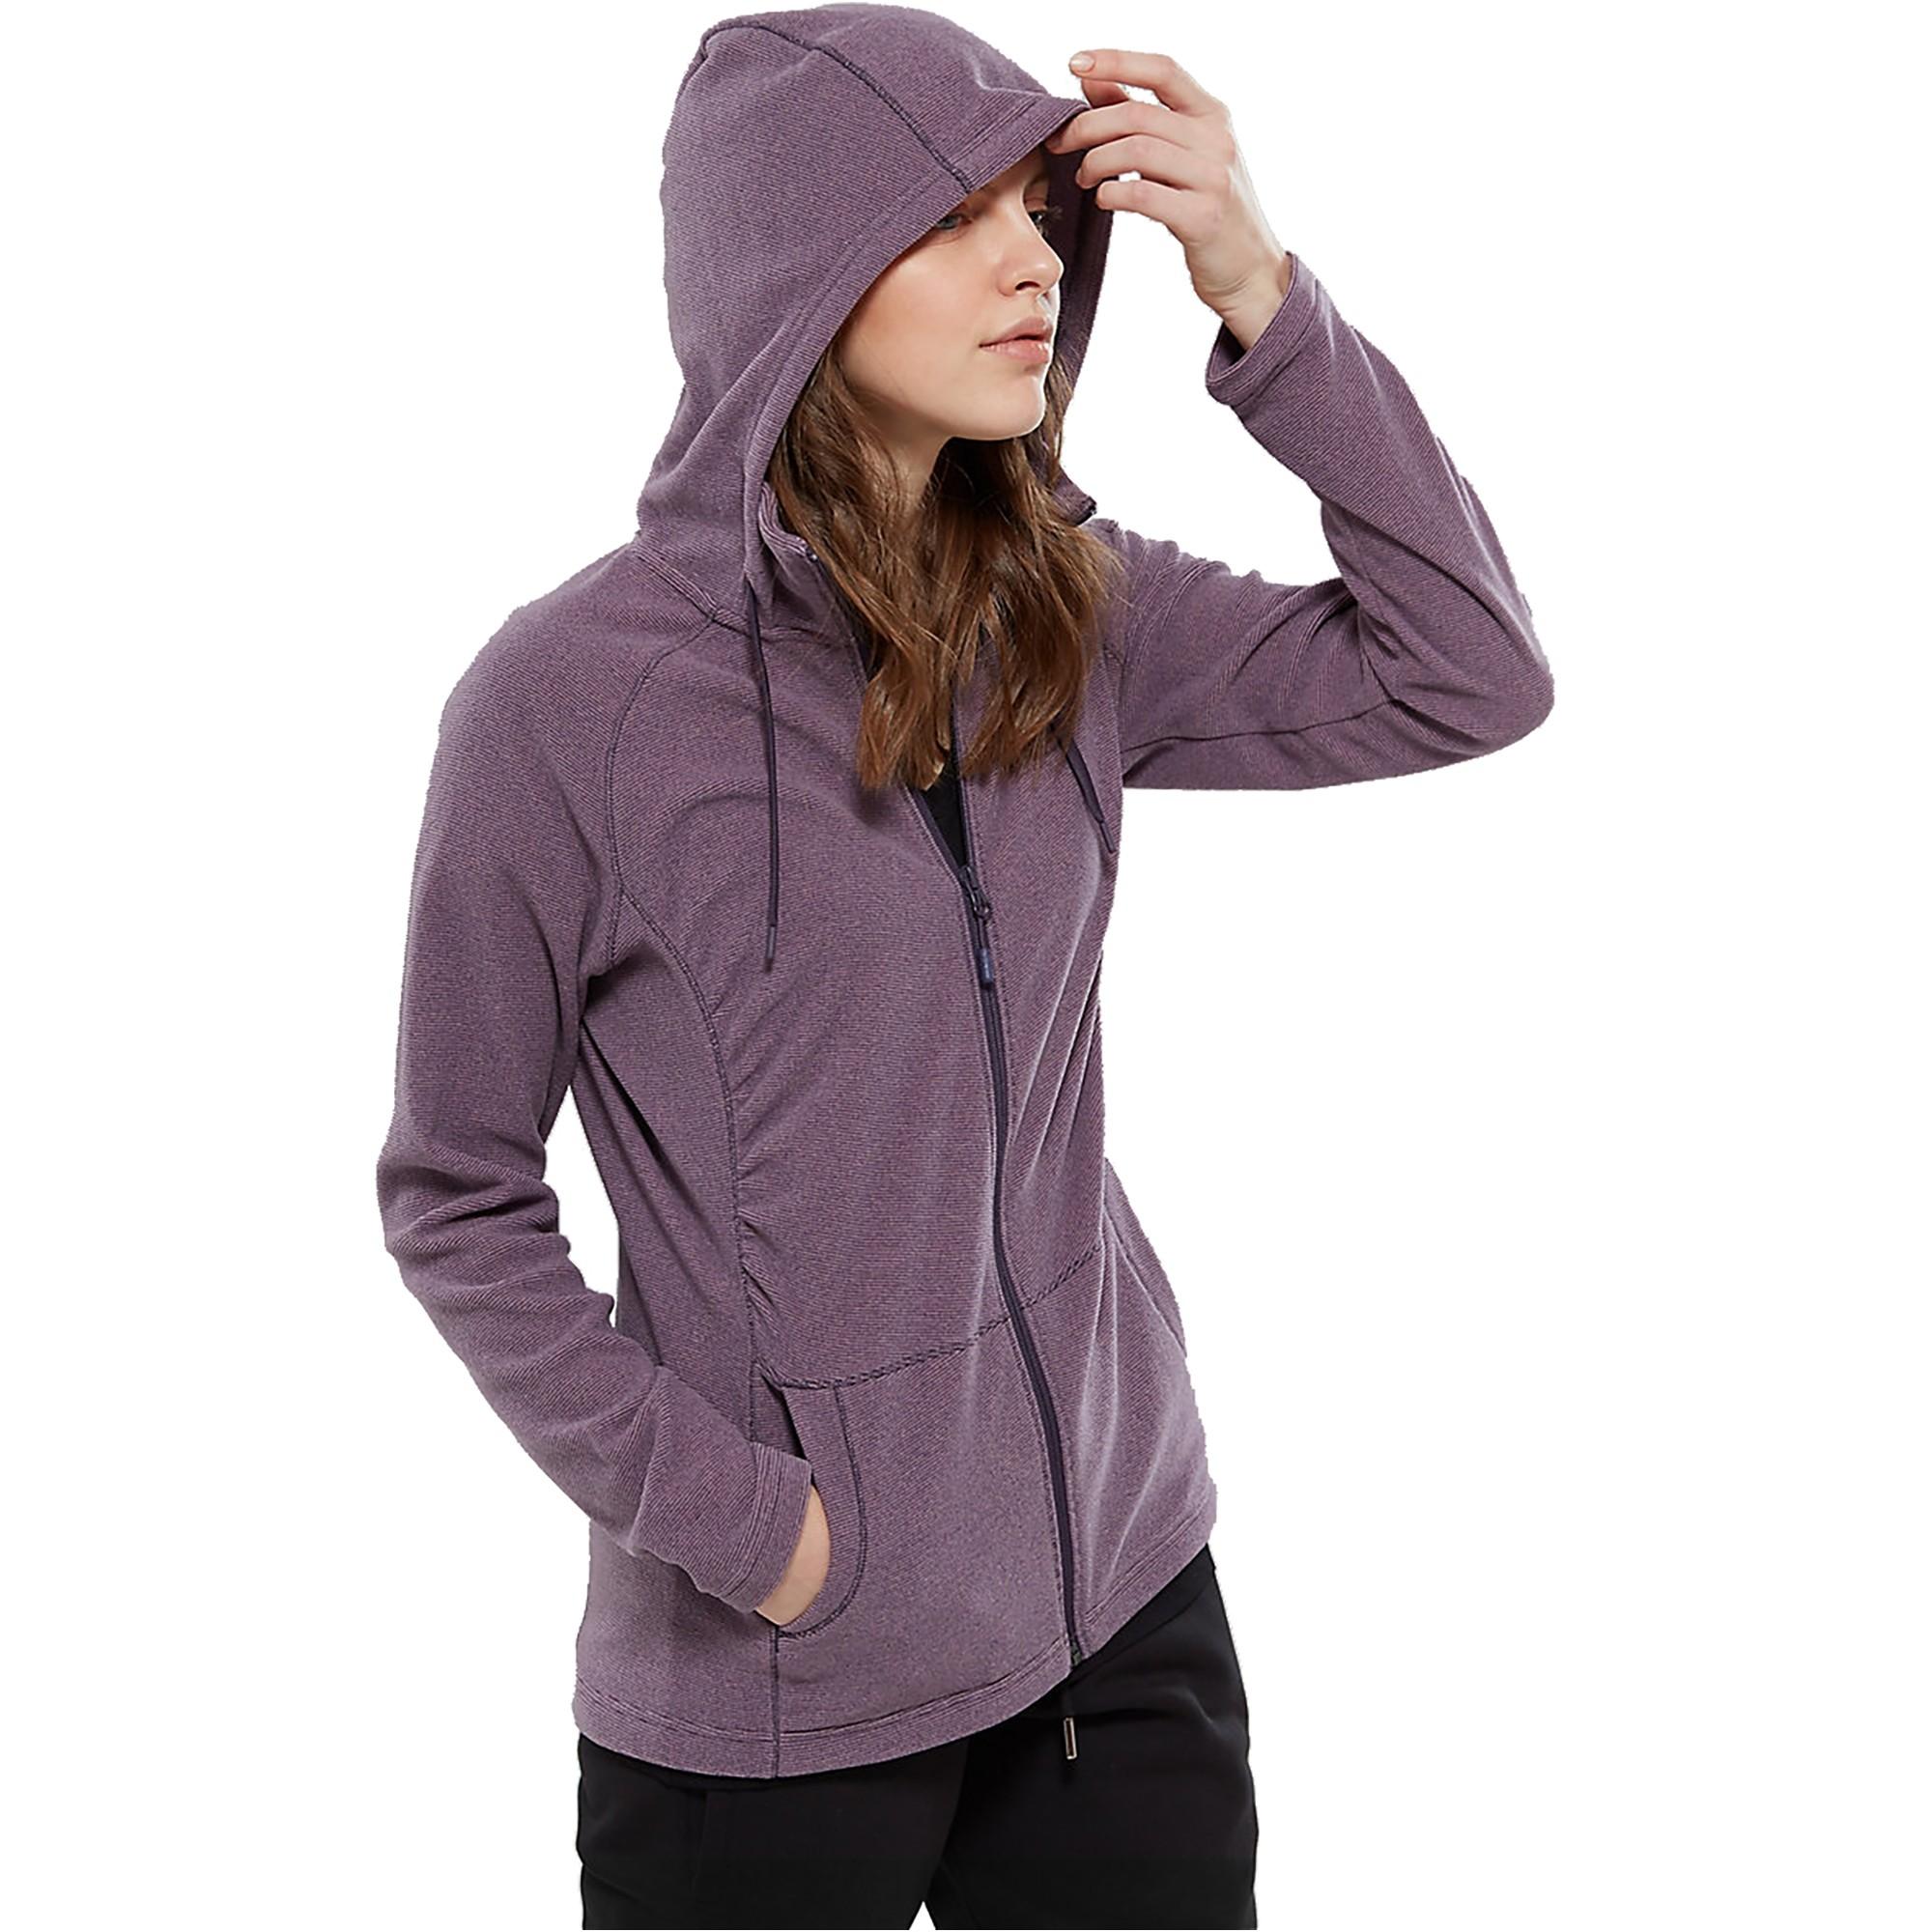 The-North-Face-Womens-Mezzaluna-Full-Zip-Hoodie-Dark-Eggplant-Purple-Stripe-2-W17